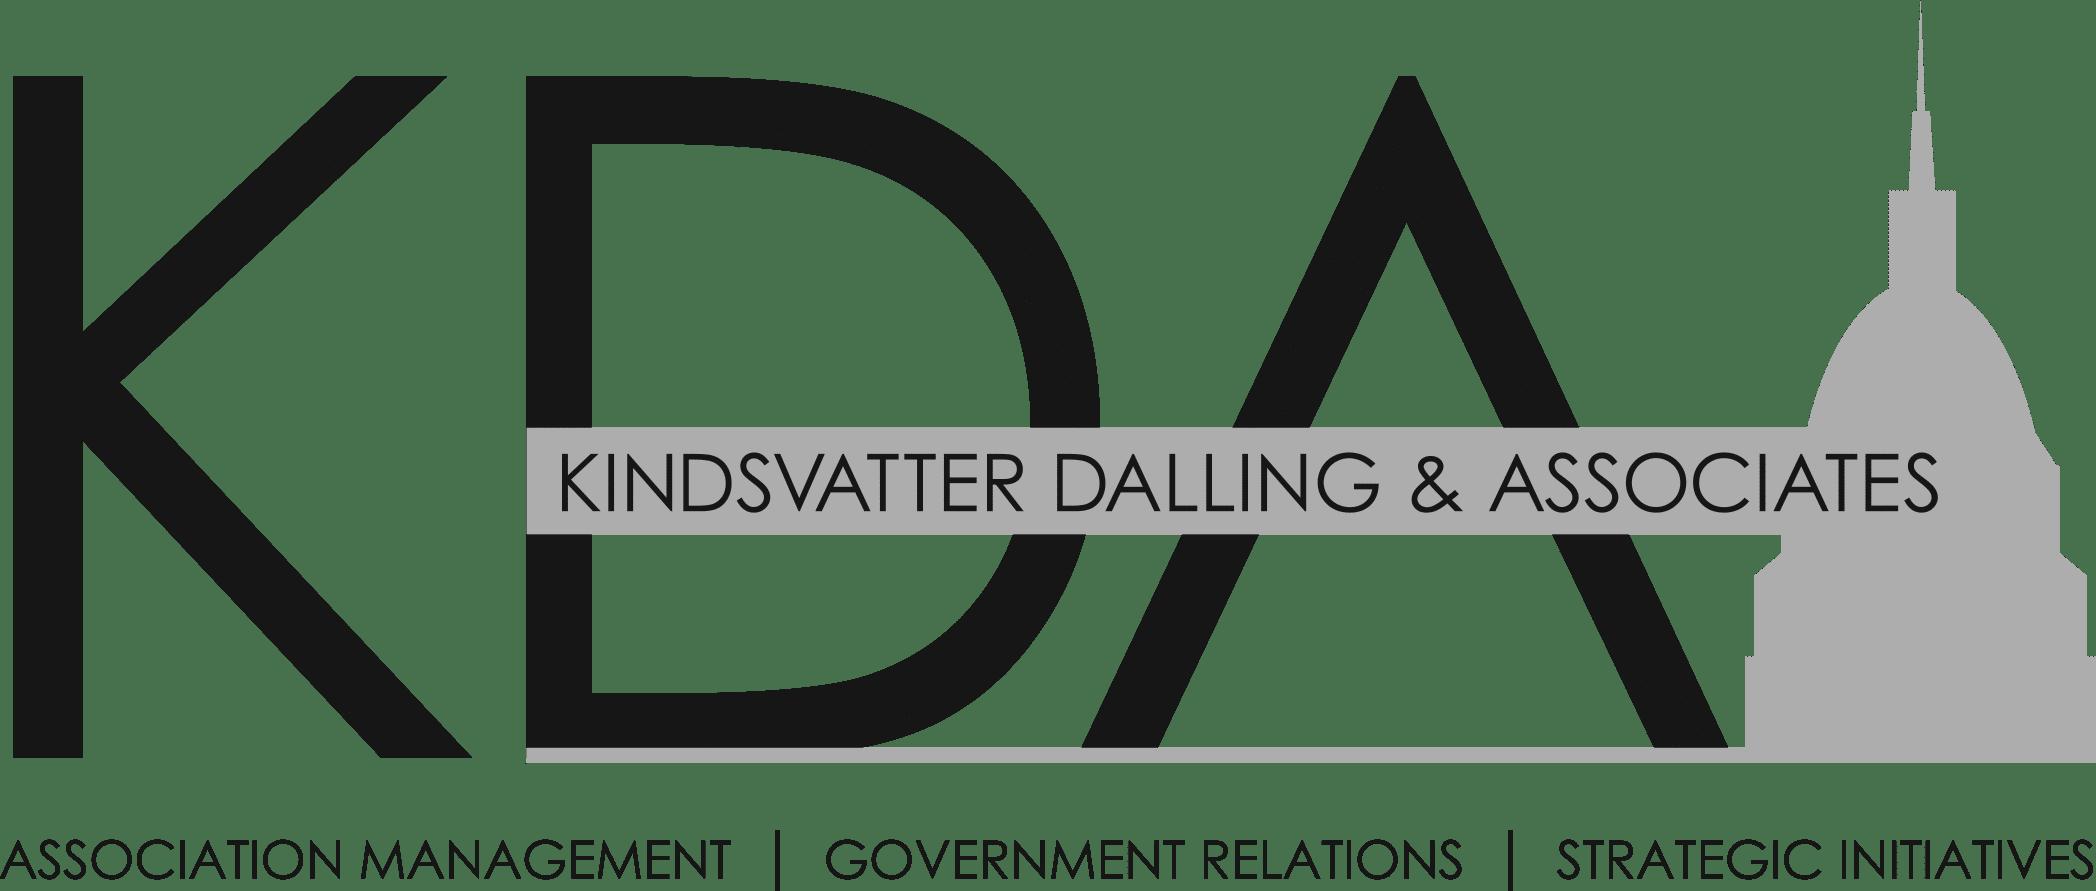 Kindsvatter, Dalling & Associates, Inc.